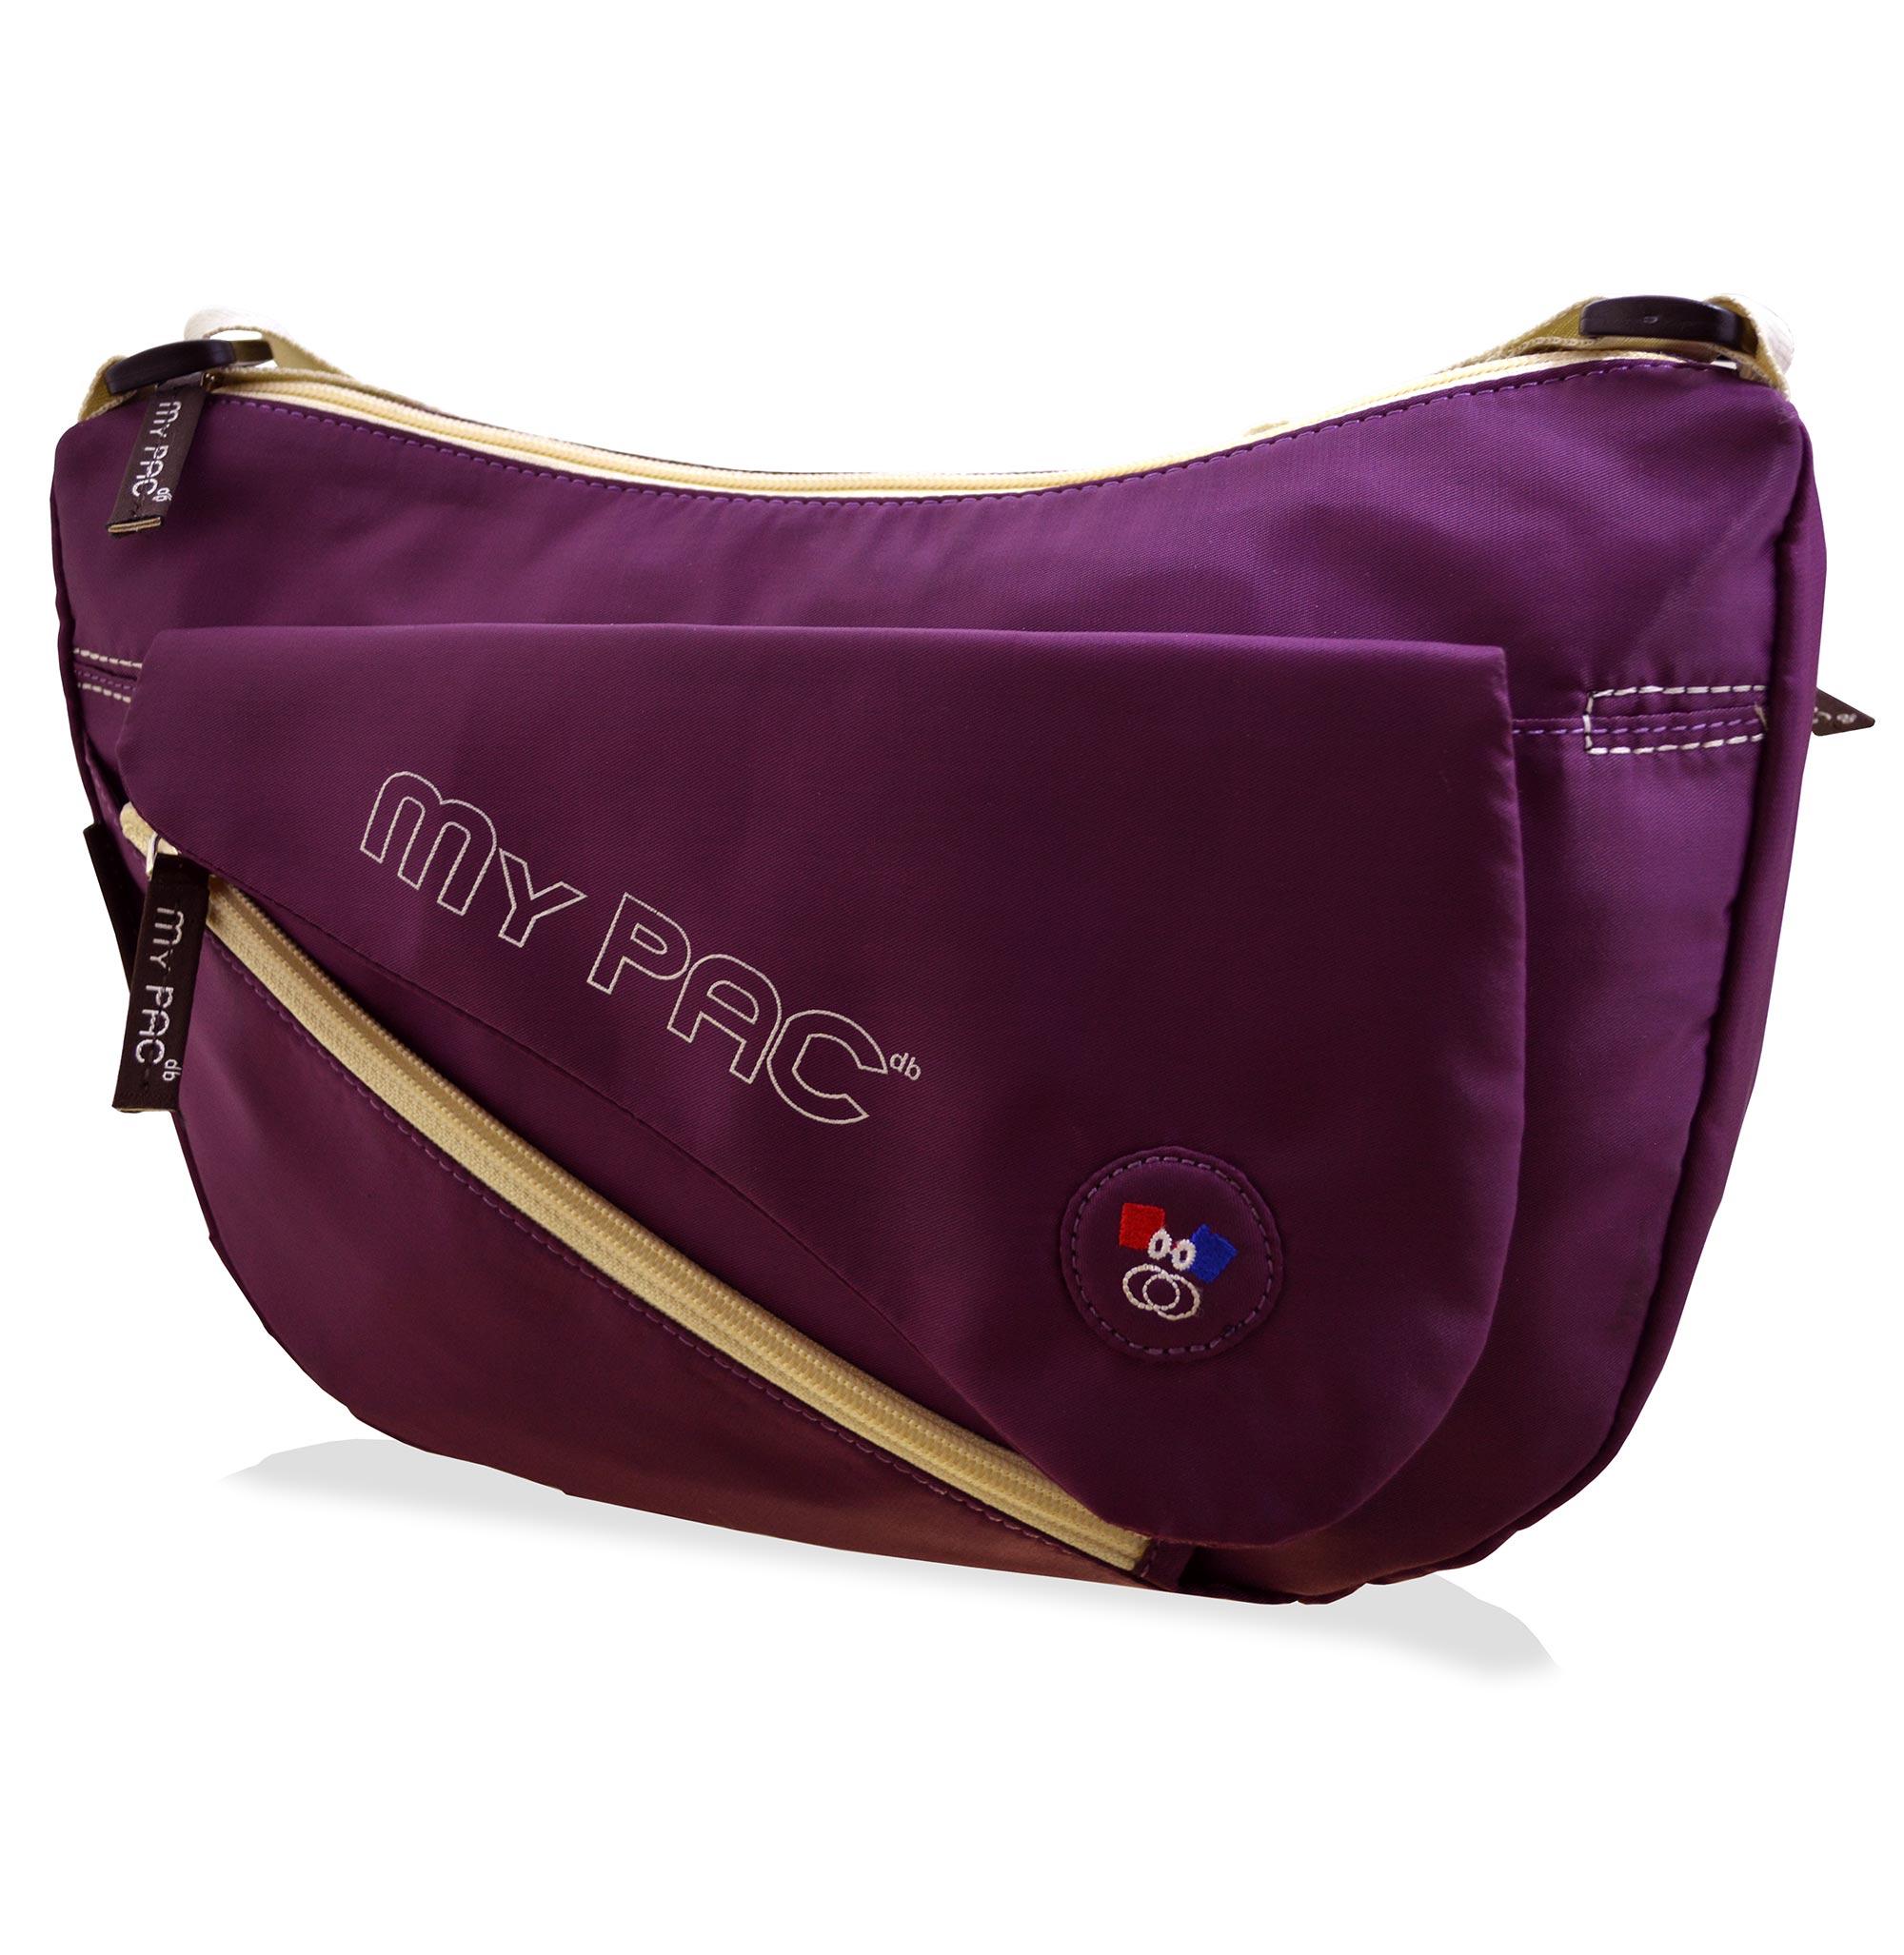 mypac ViVaa Polyester Sling bag for girls purple C11565 72